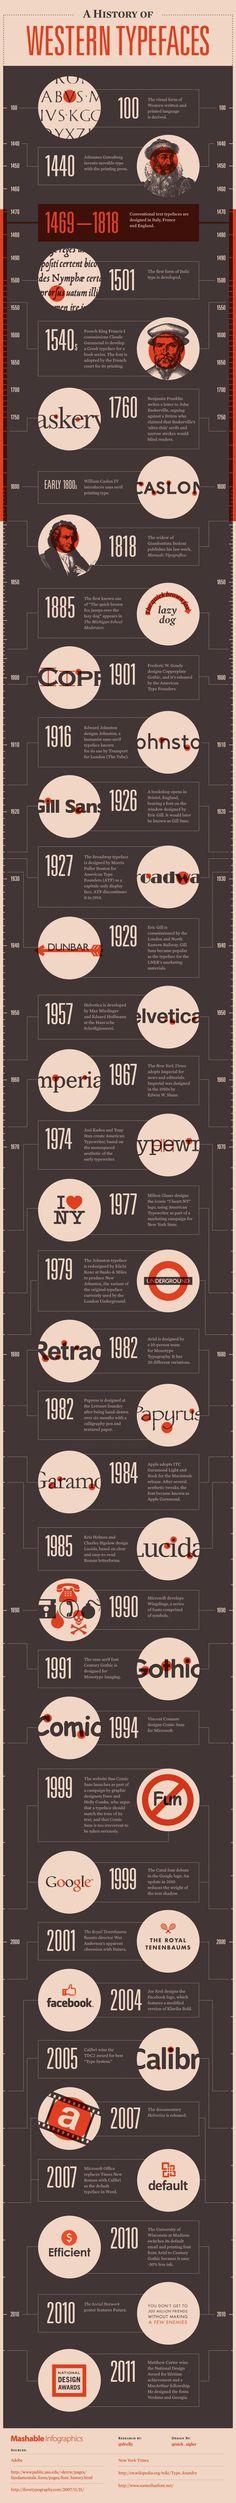 mashable_infographic_history-western-typefaces(2)